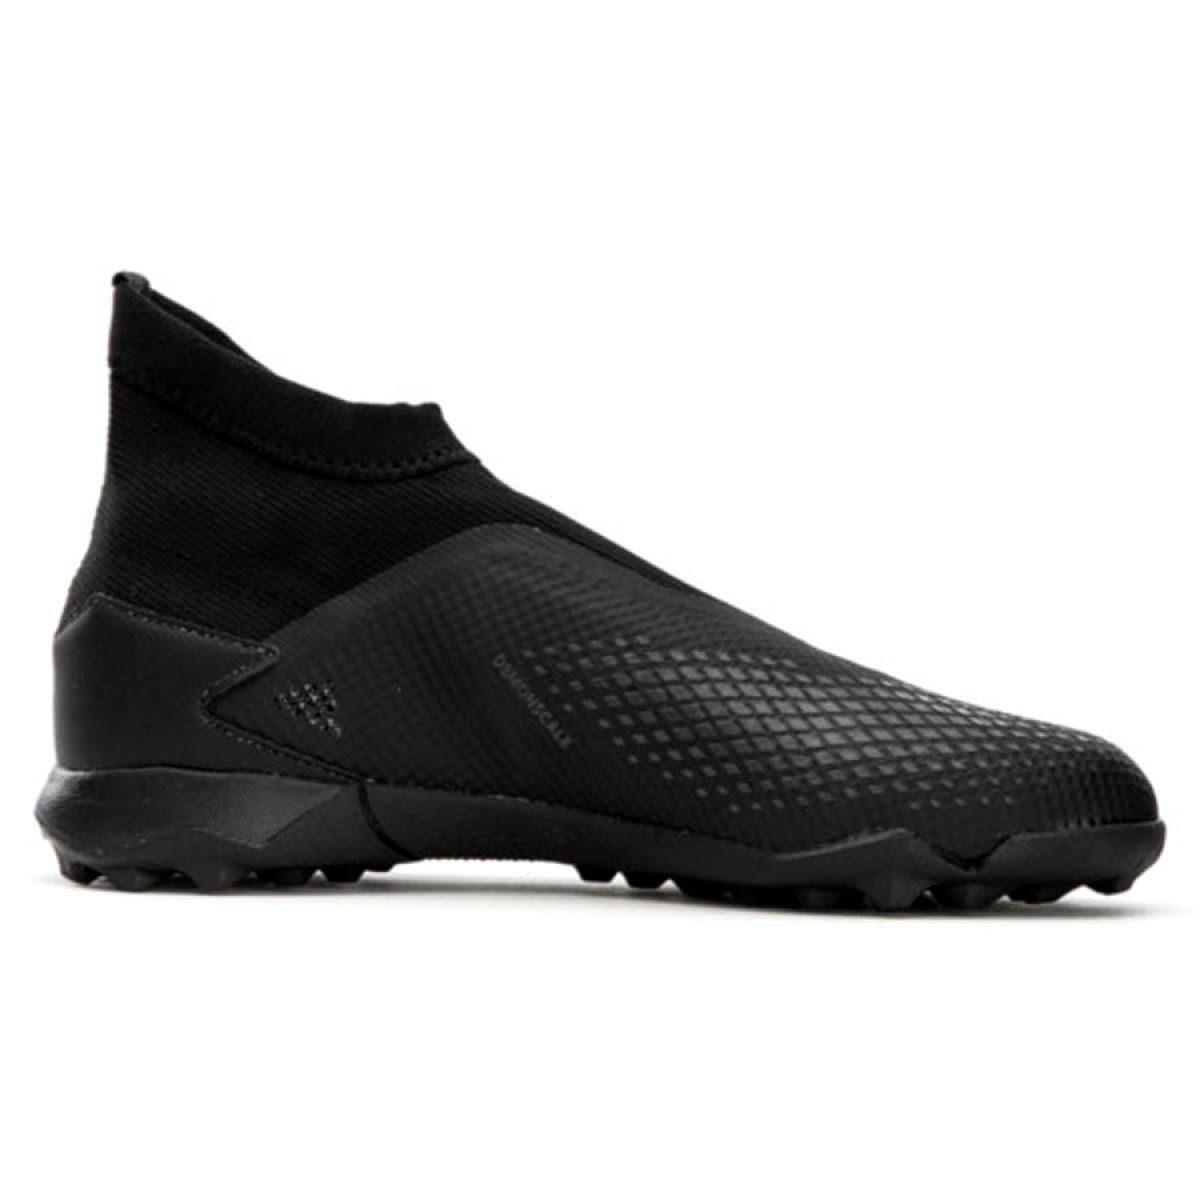 Adidas Predator 20.3 Laceless Turf Boots Football - Black